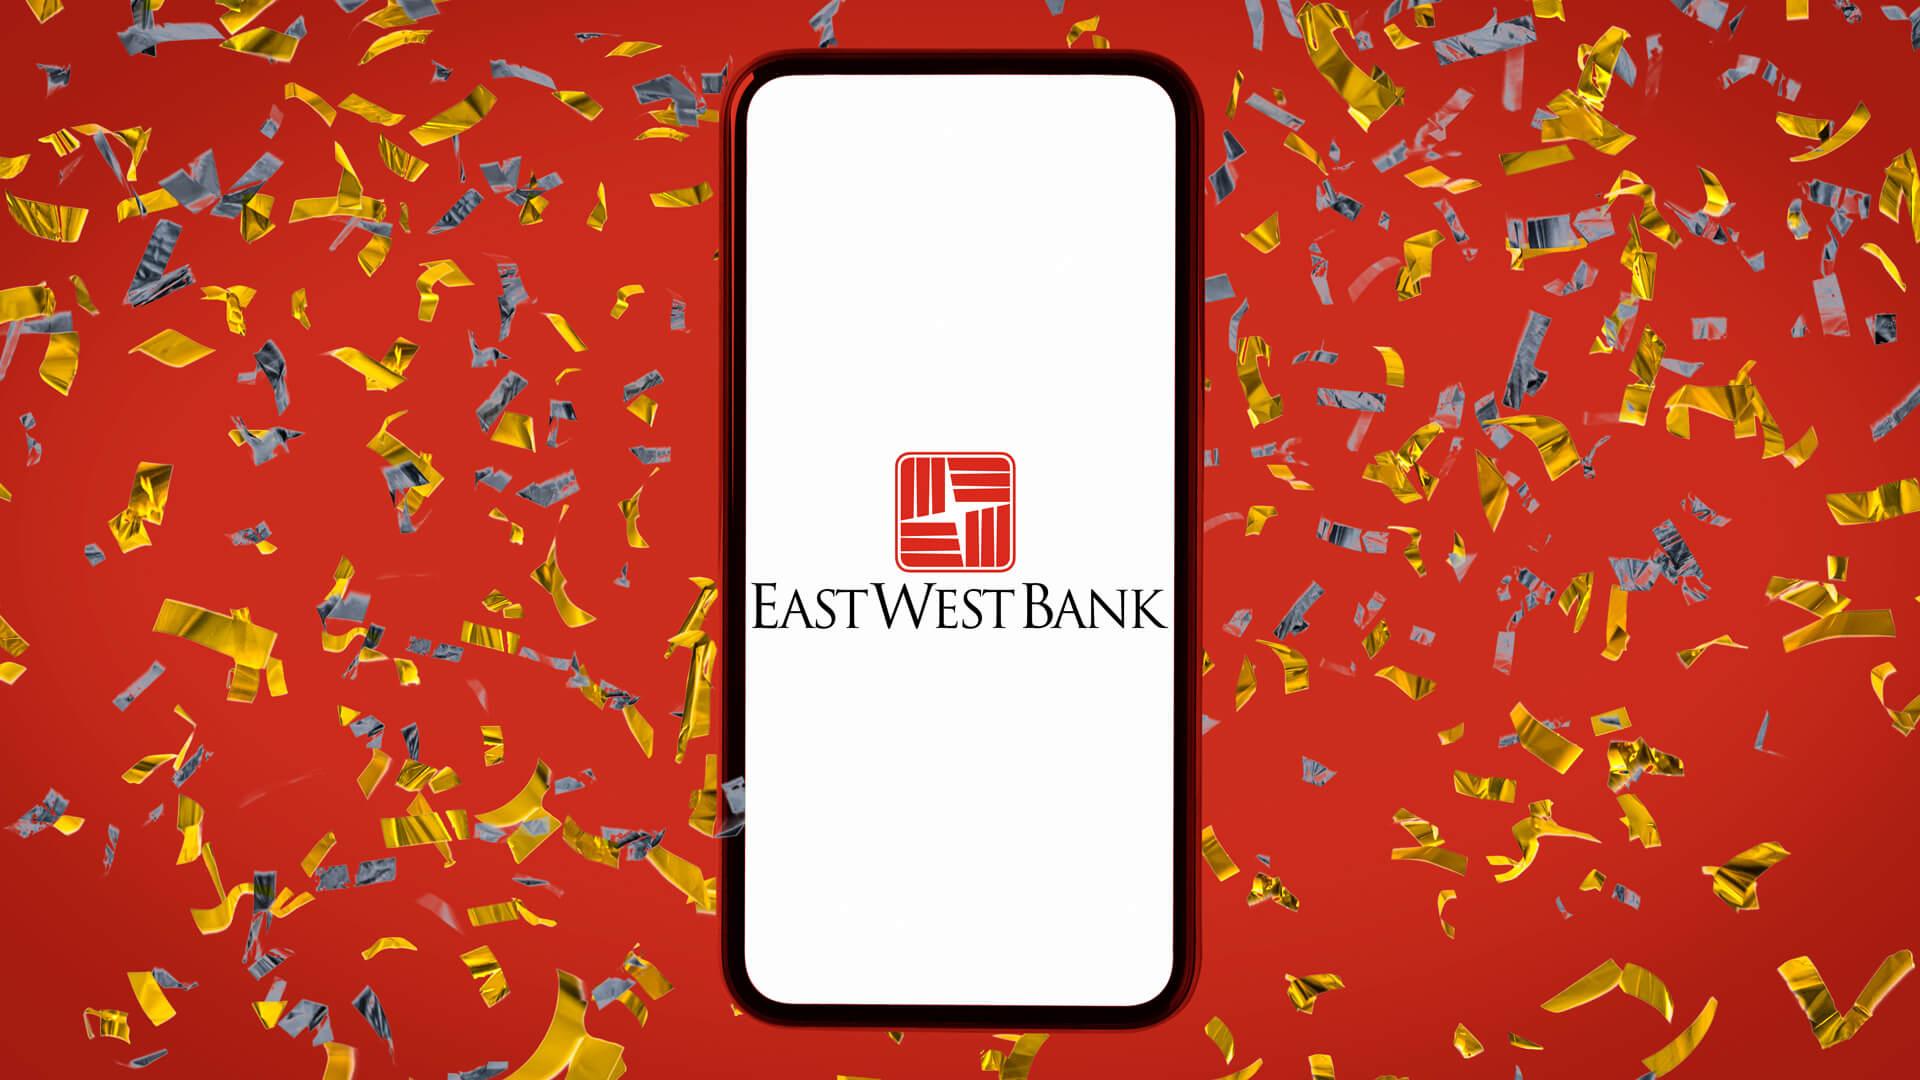 East West Bank promotion